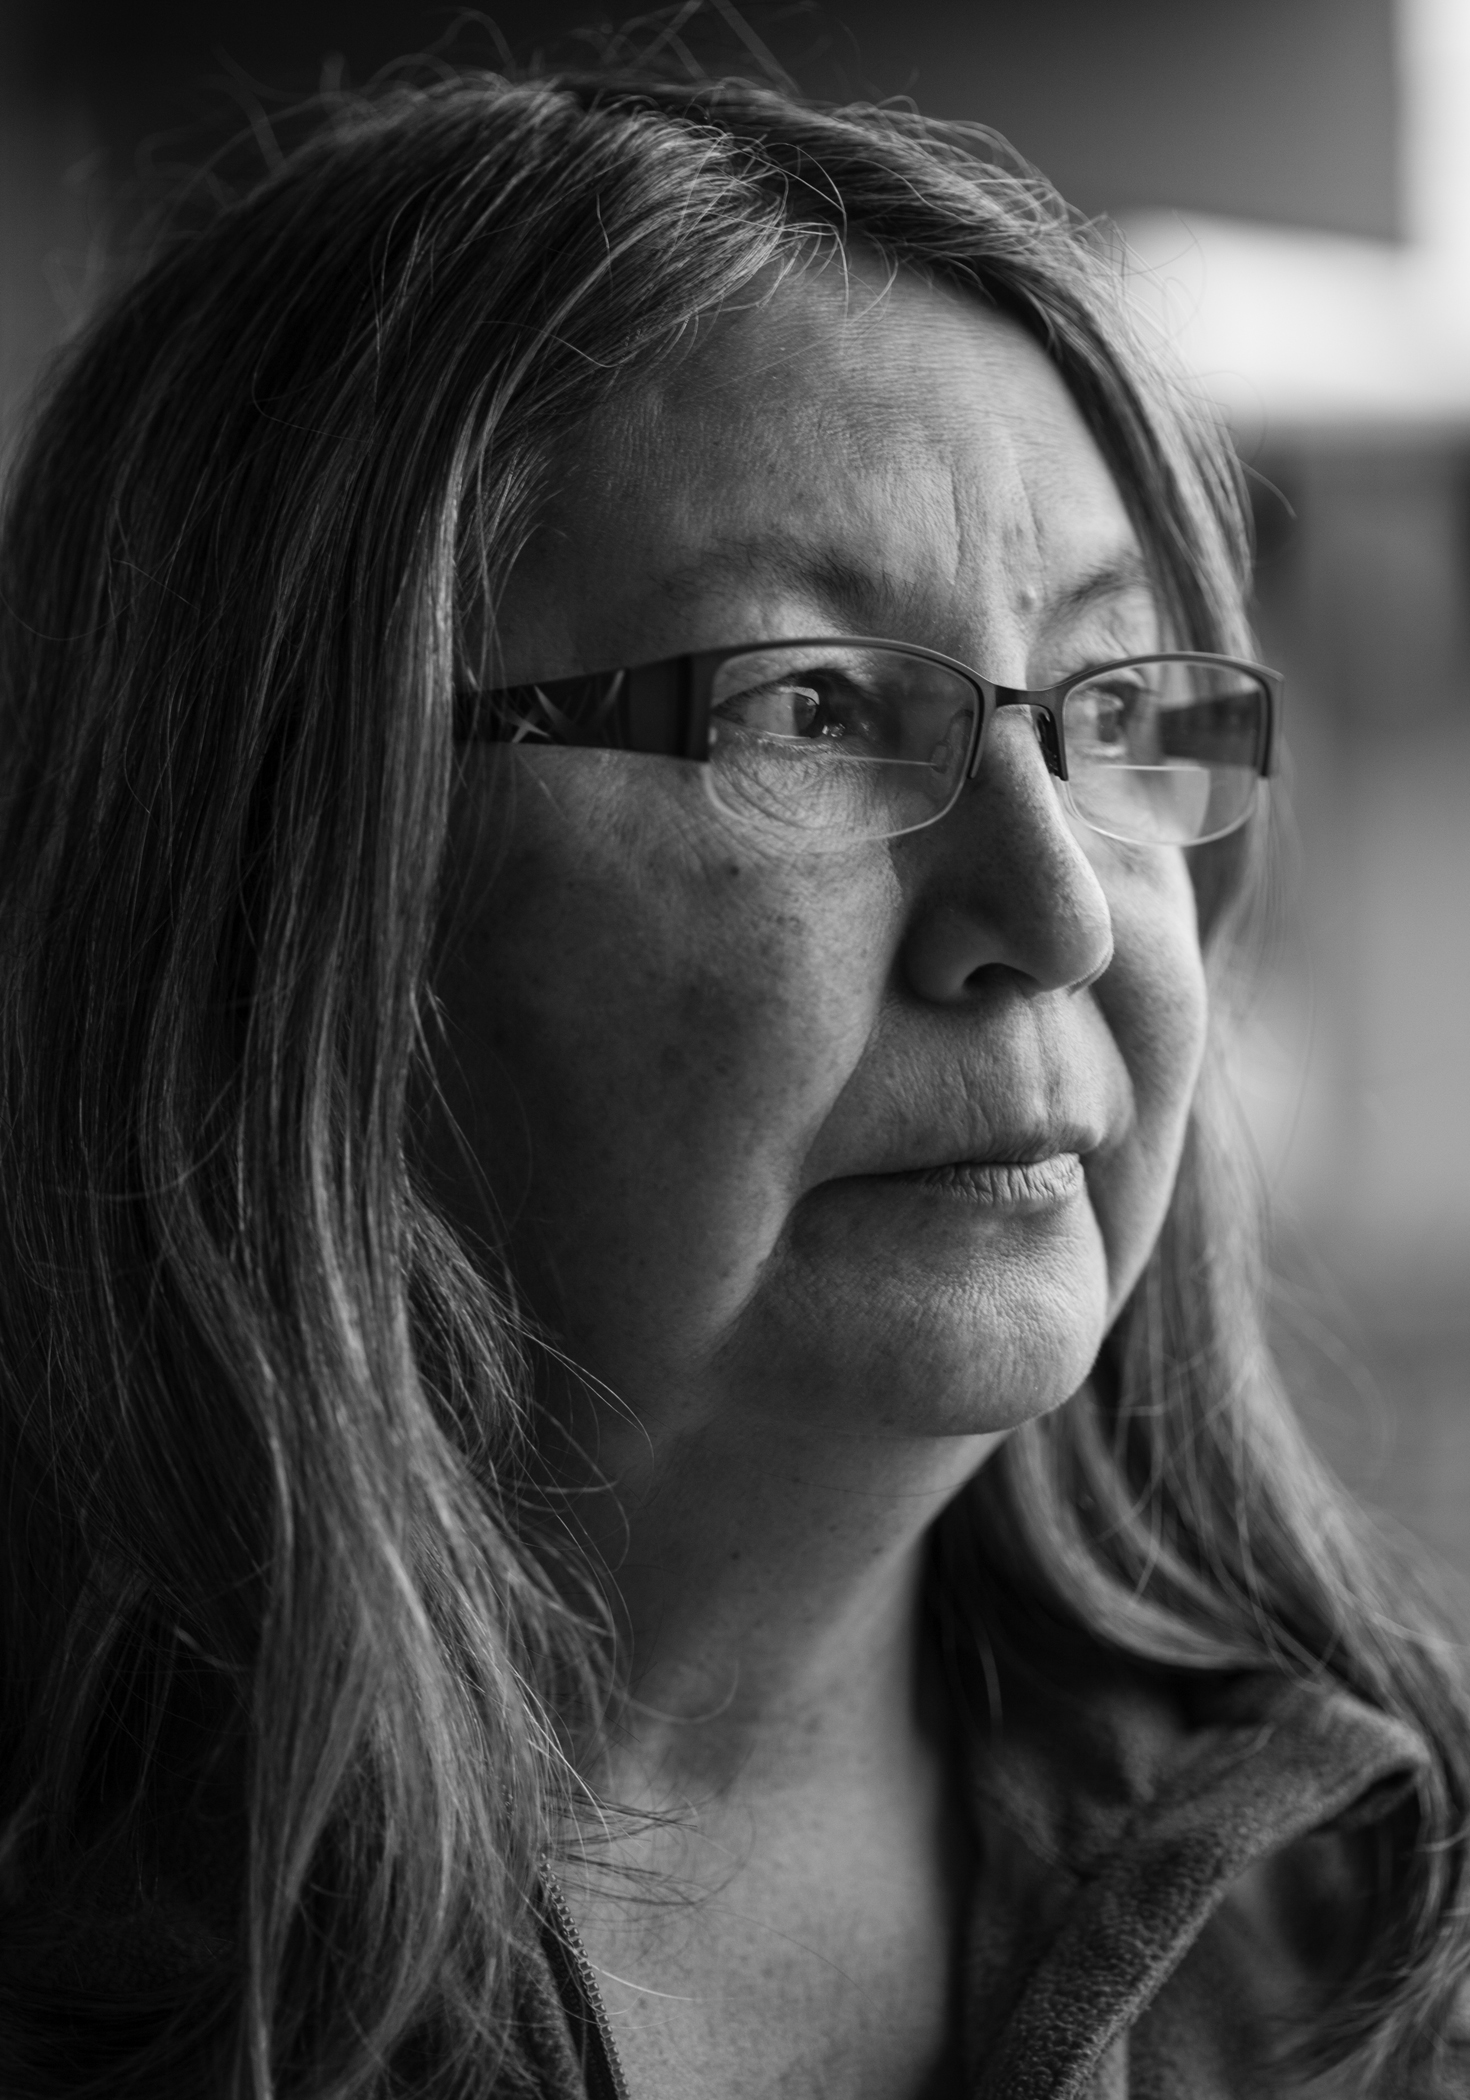 KCA-014 Ki-tah-pah-tumak aski ethinewak [keeper of the land] Shirley, O-Pipon-Na-Piwin Cree Nation, 2016, AP.jpg